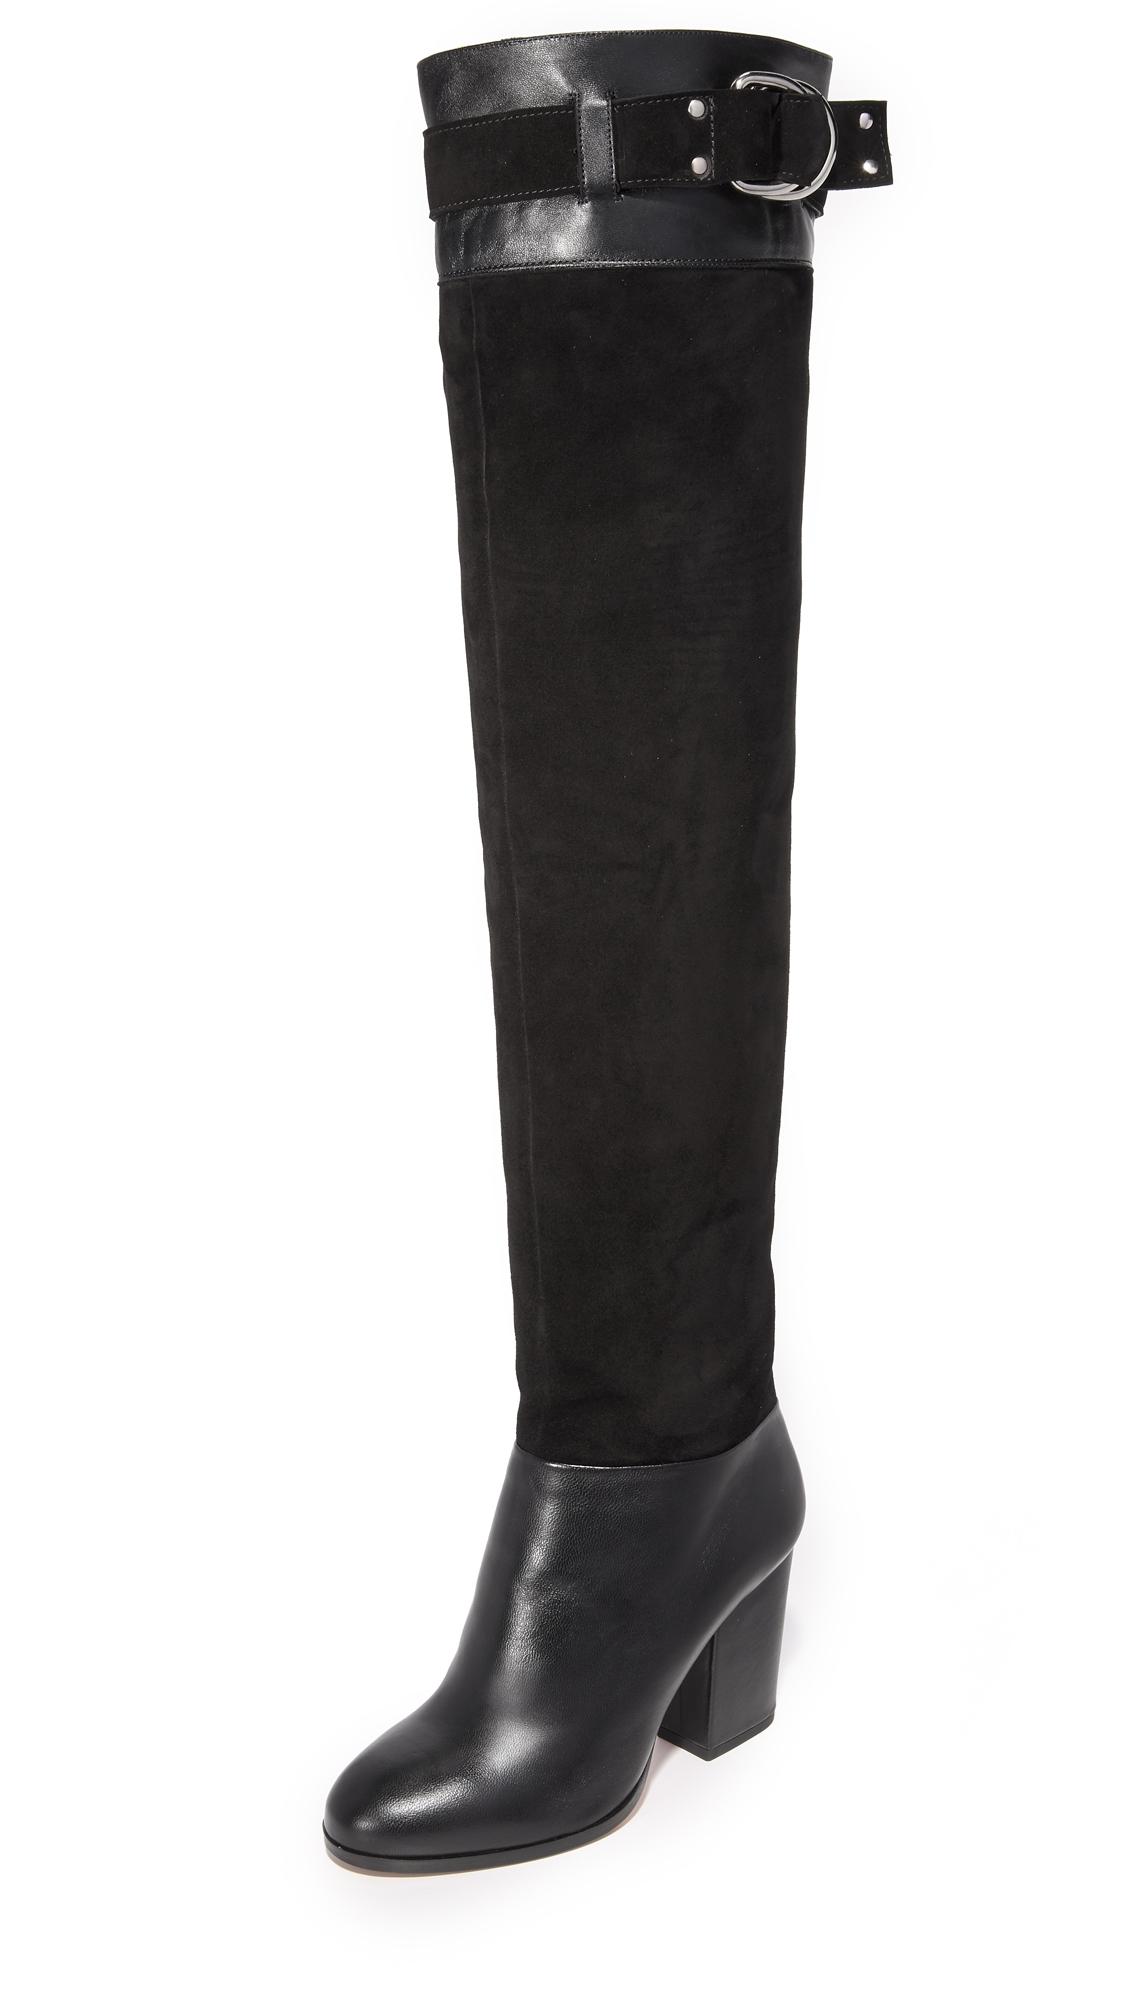 Alexa Wagner Bellinda Boots - Black